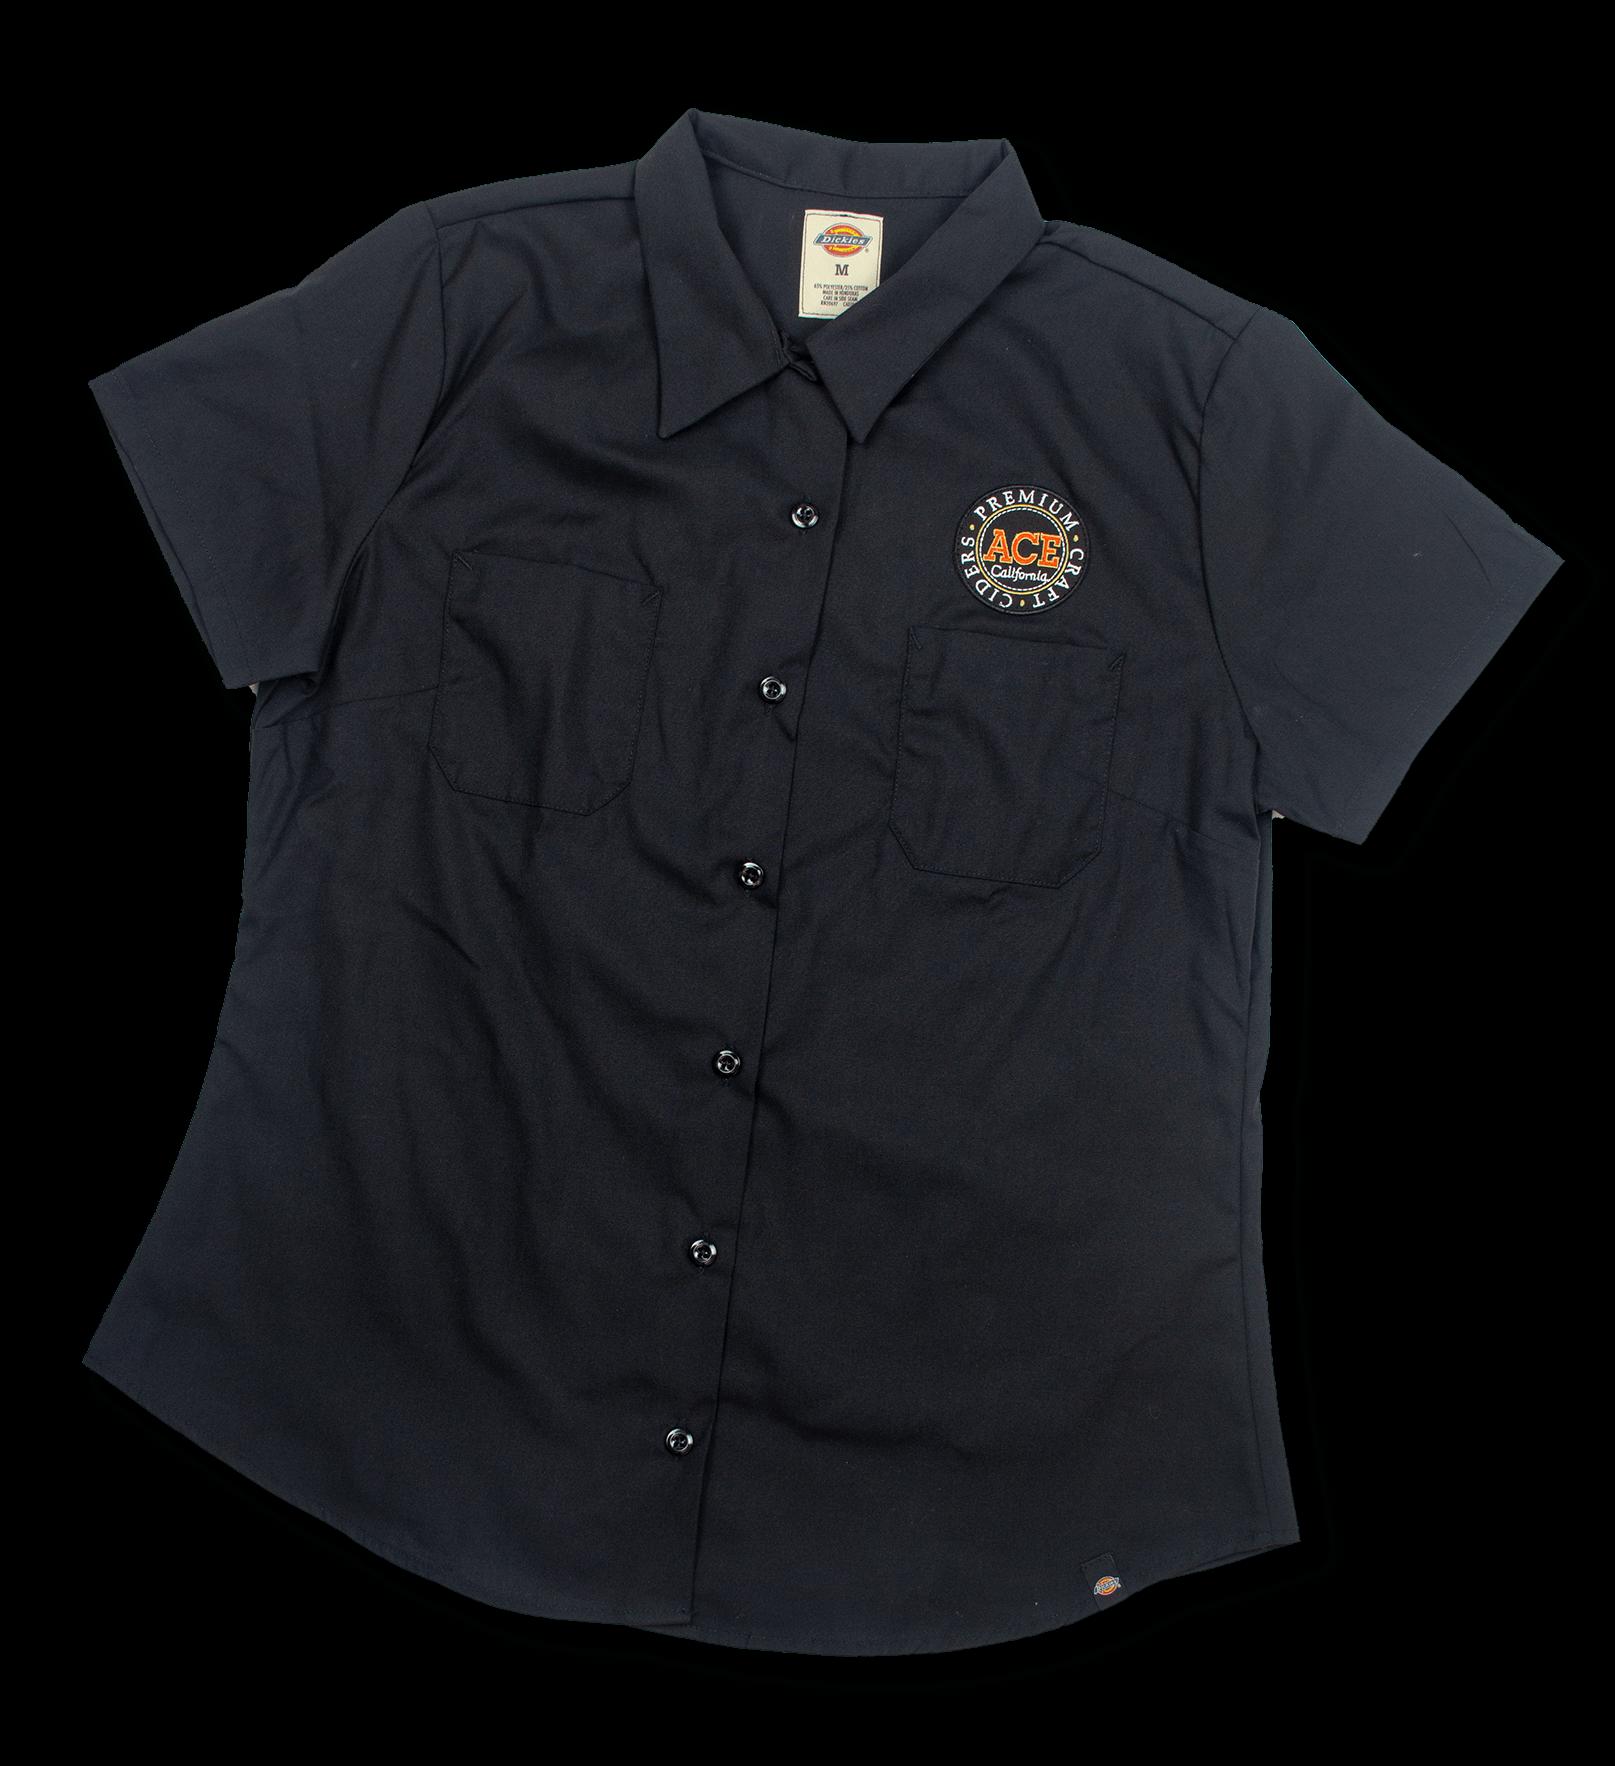 Ace Cider Women's Dickies Shirt